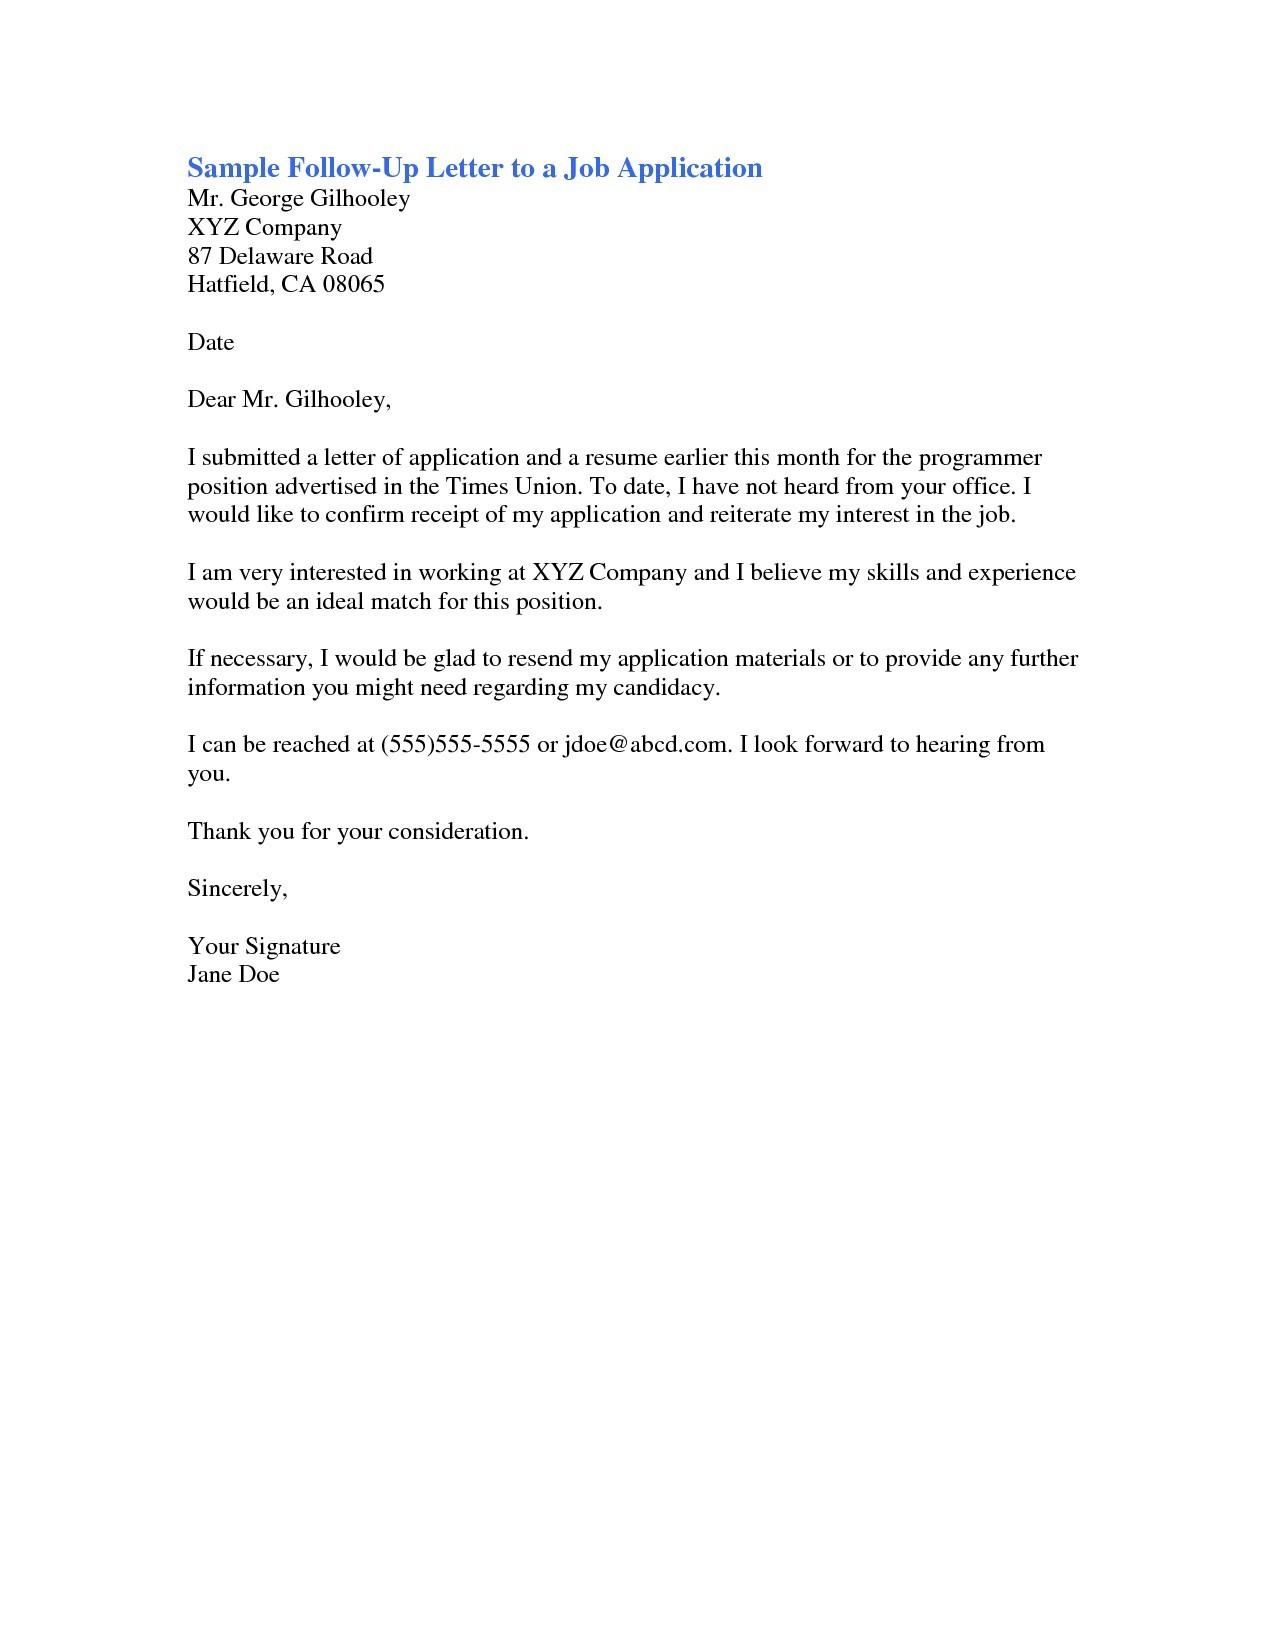 template letter for job application